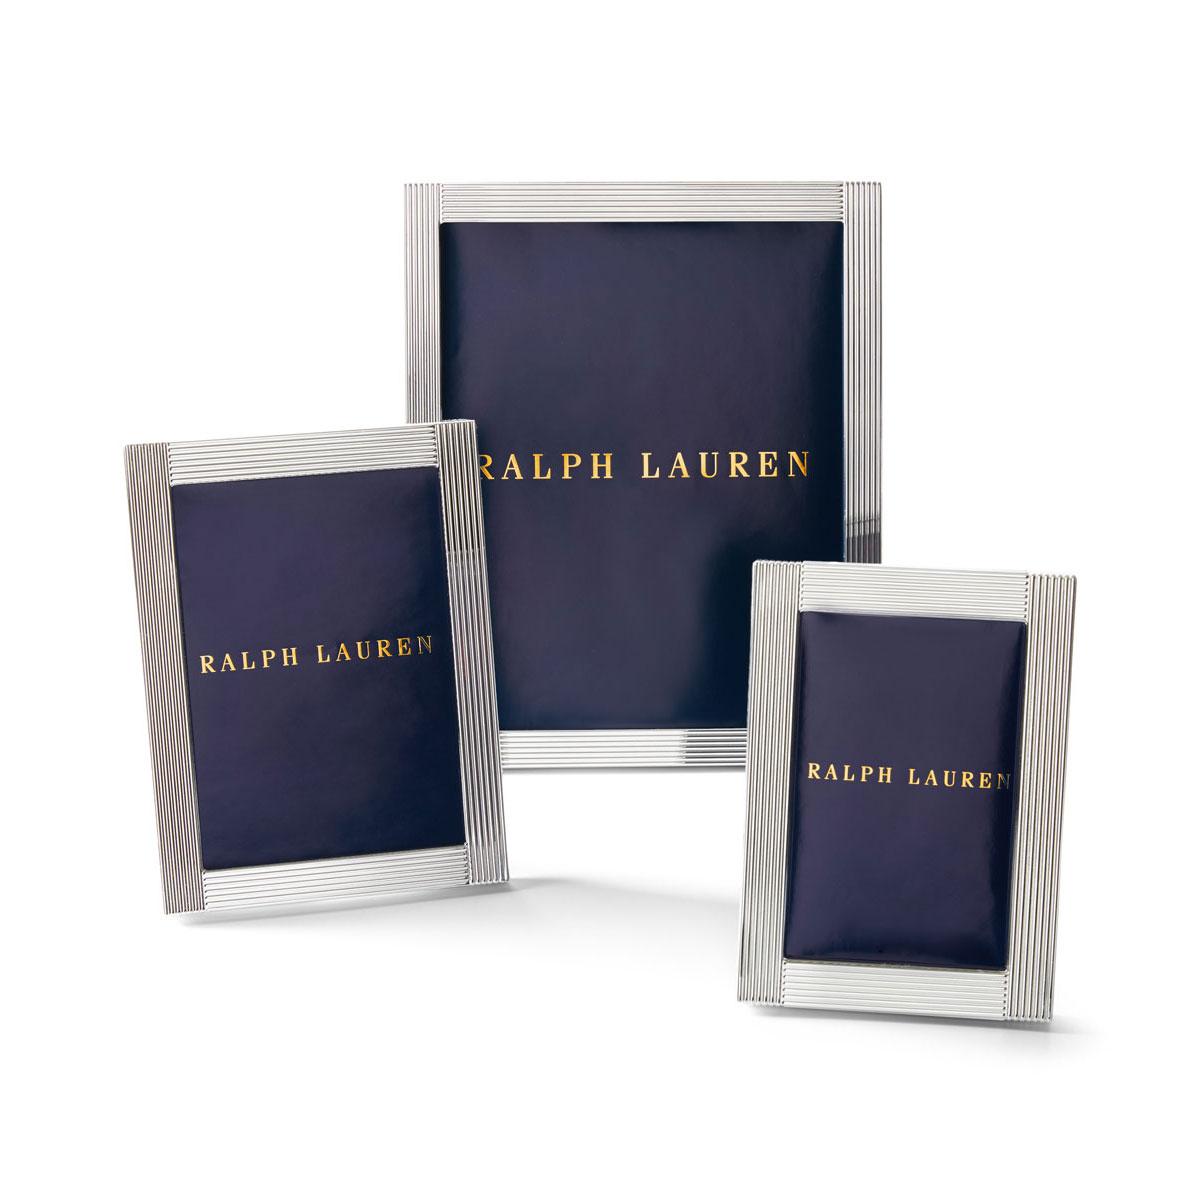 "Ralph Lauren Luke 5x7"" Picture Frame"